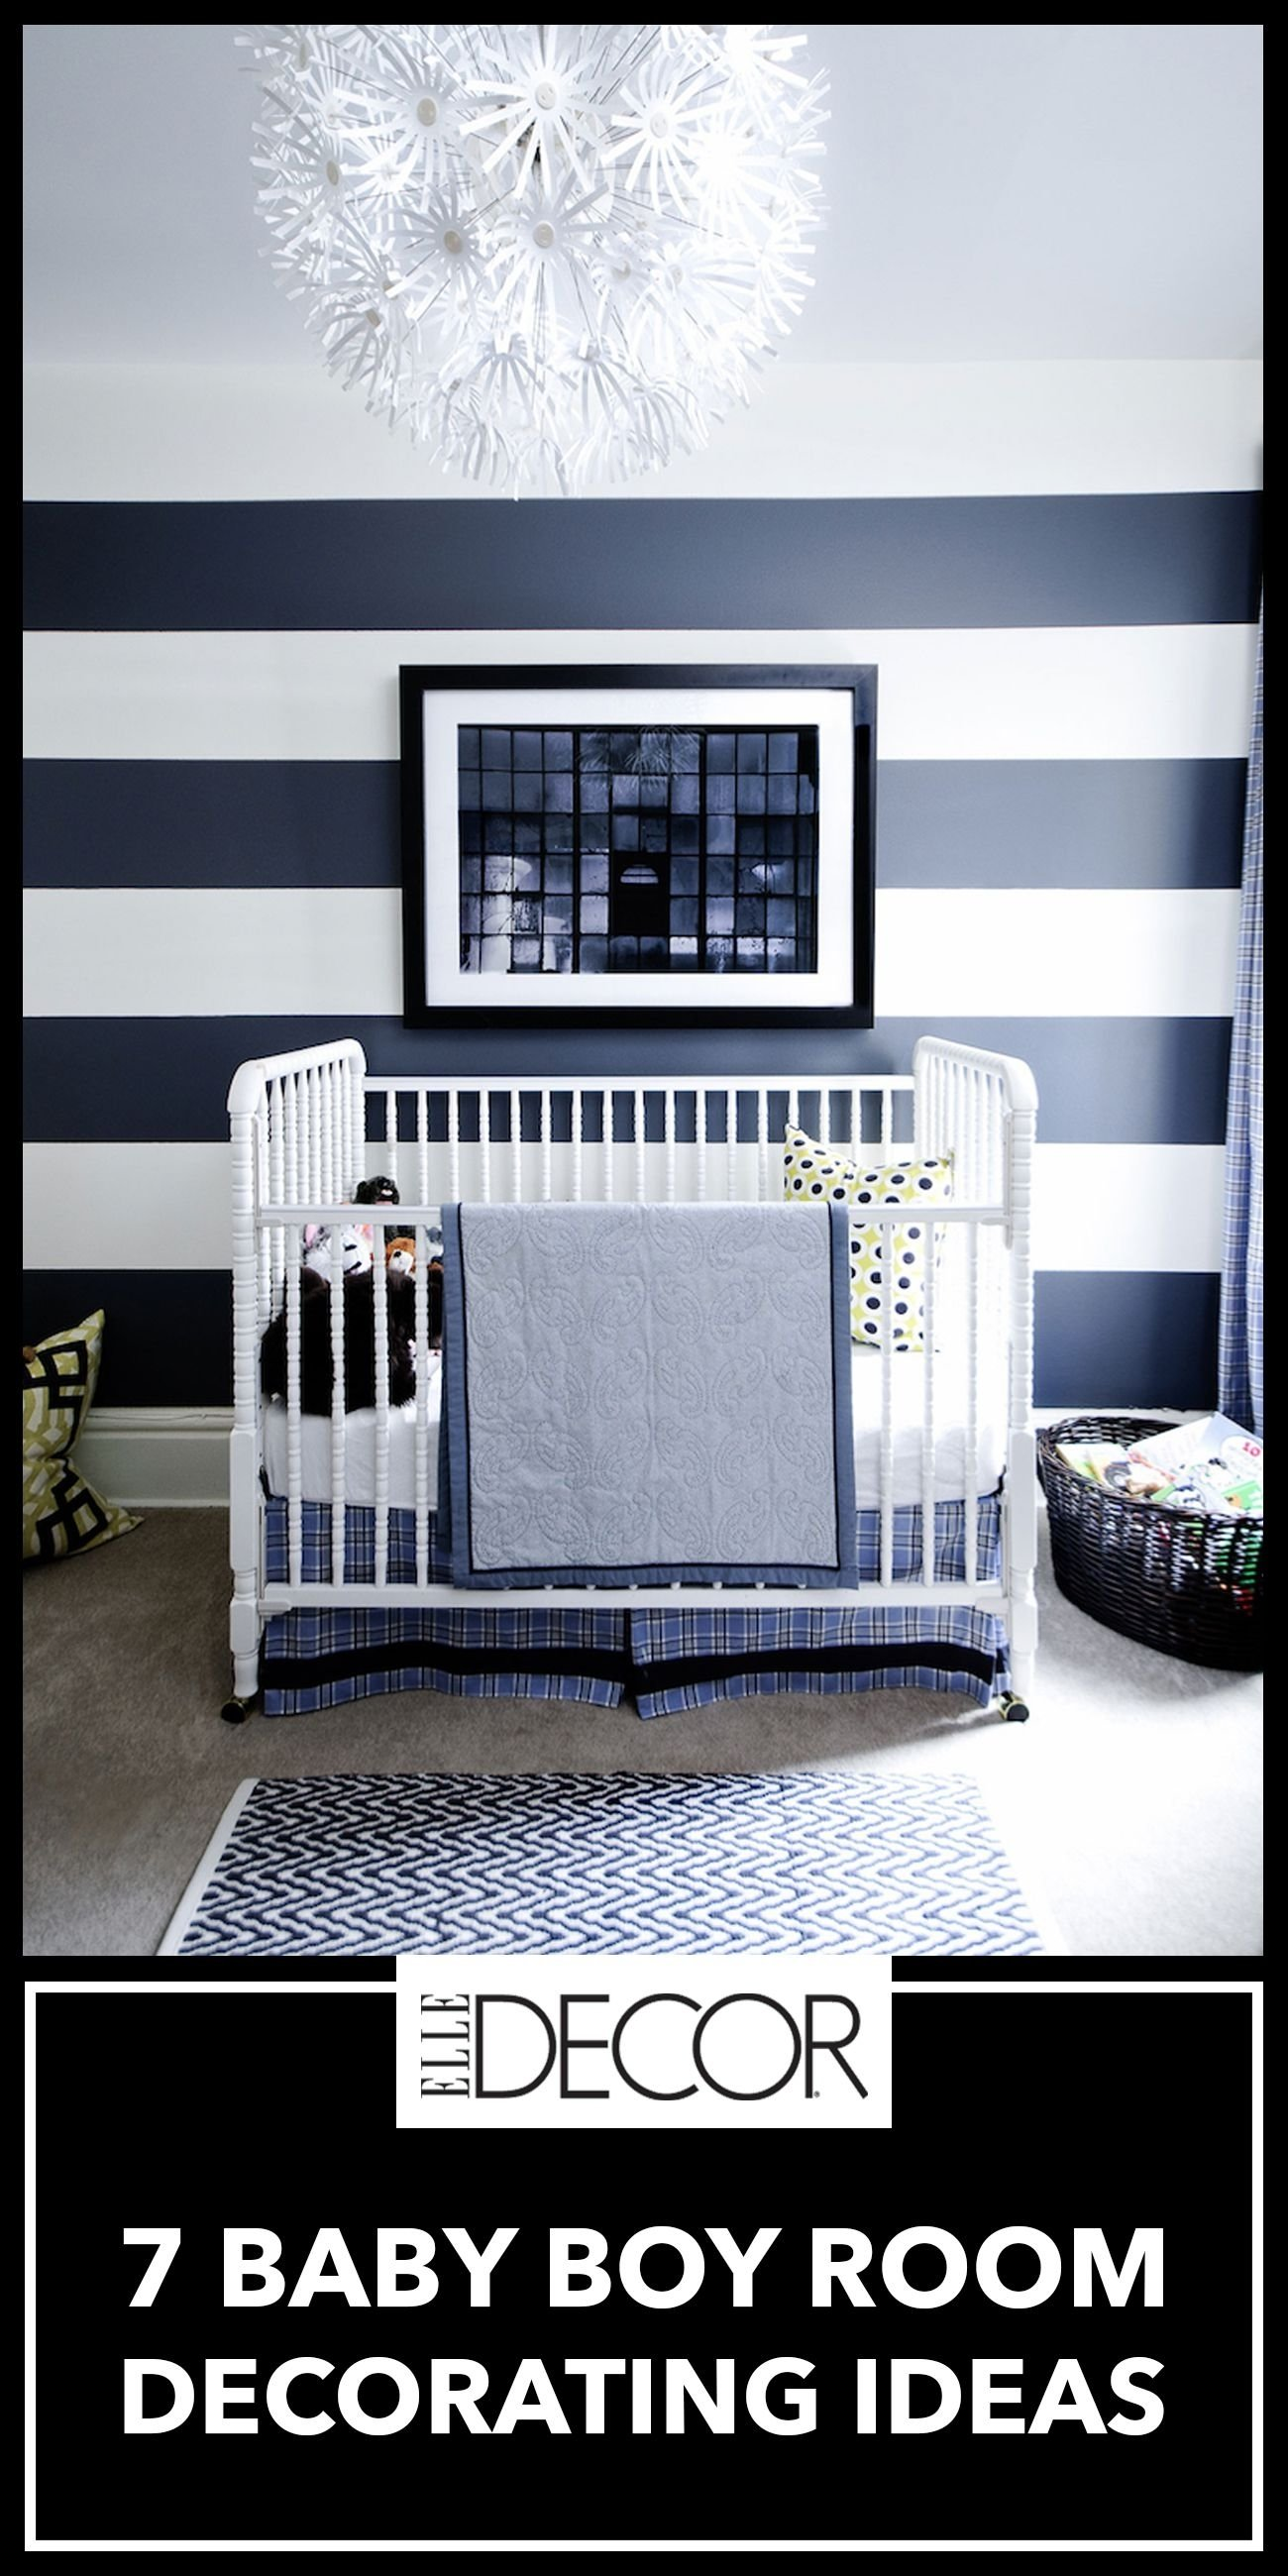 10 Unique Baby Boy Room Decor Ideas 7 baby boy room ideas cute boy nursery decorating ideas